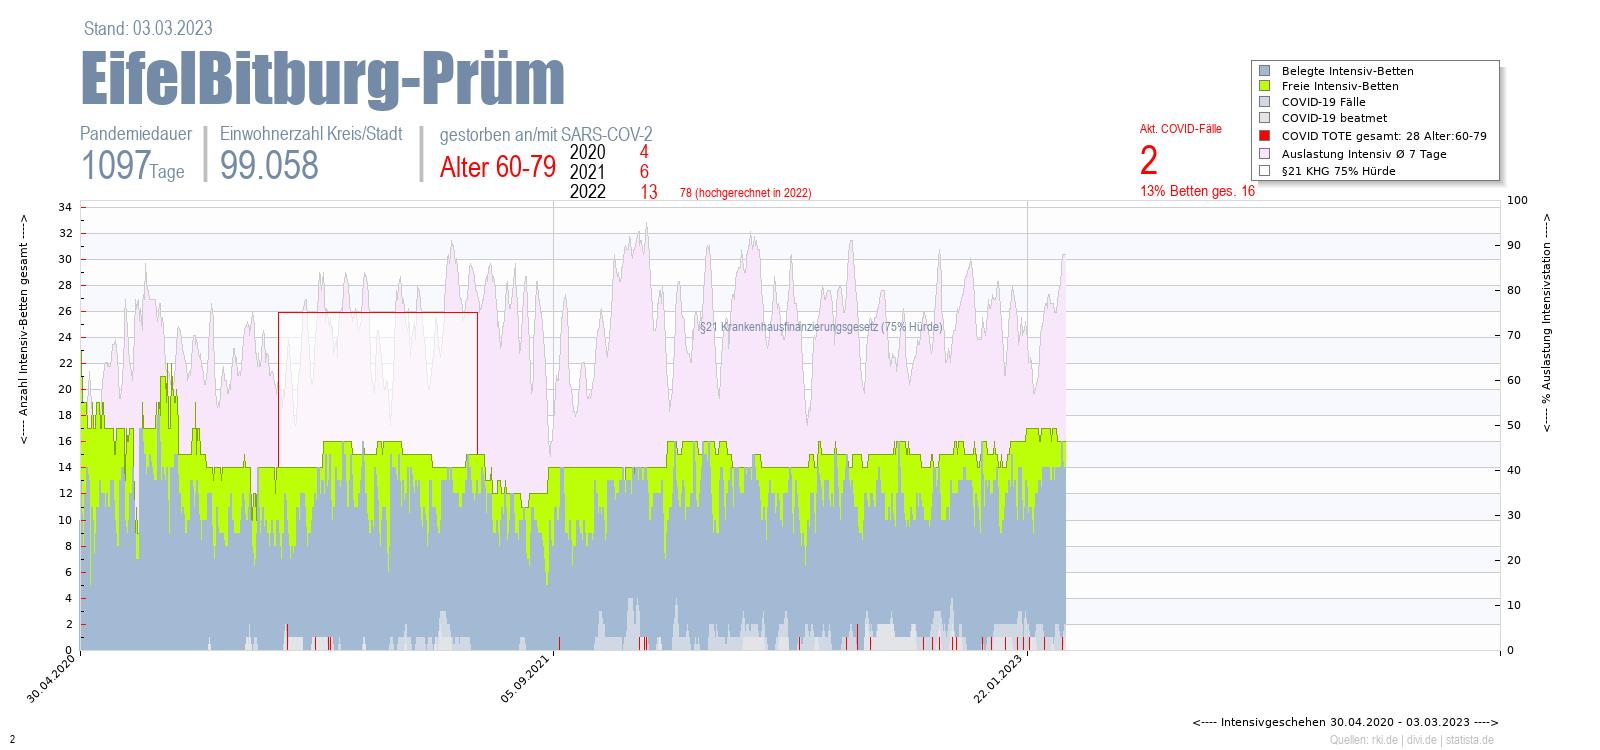 Intensivstation Auslastung EifelBitburg-Prüm Alter 0-4